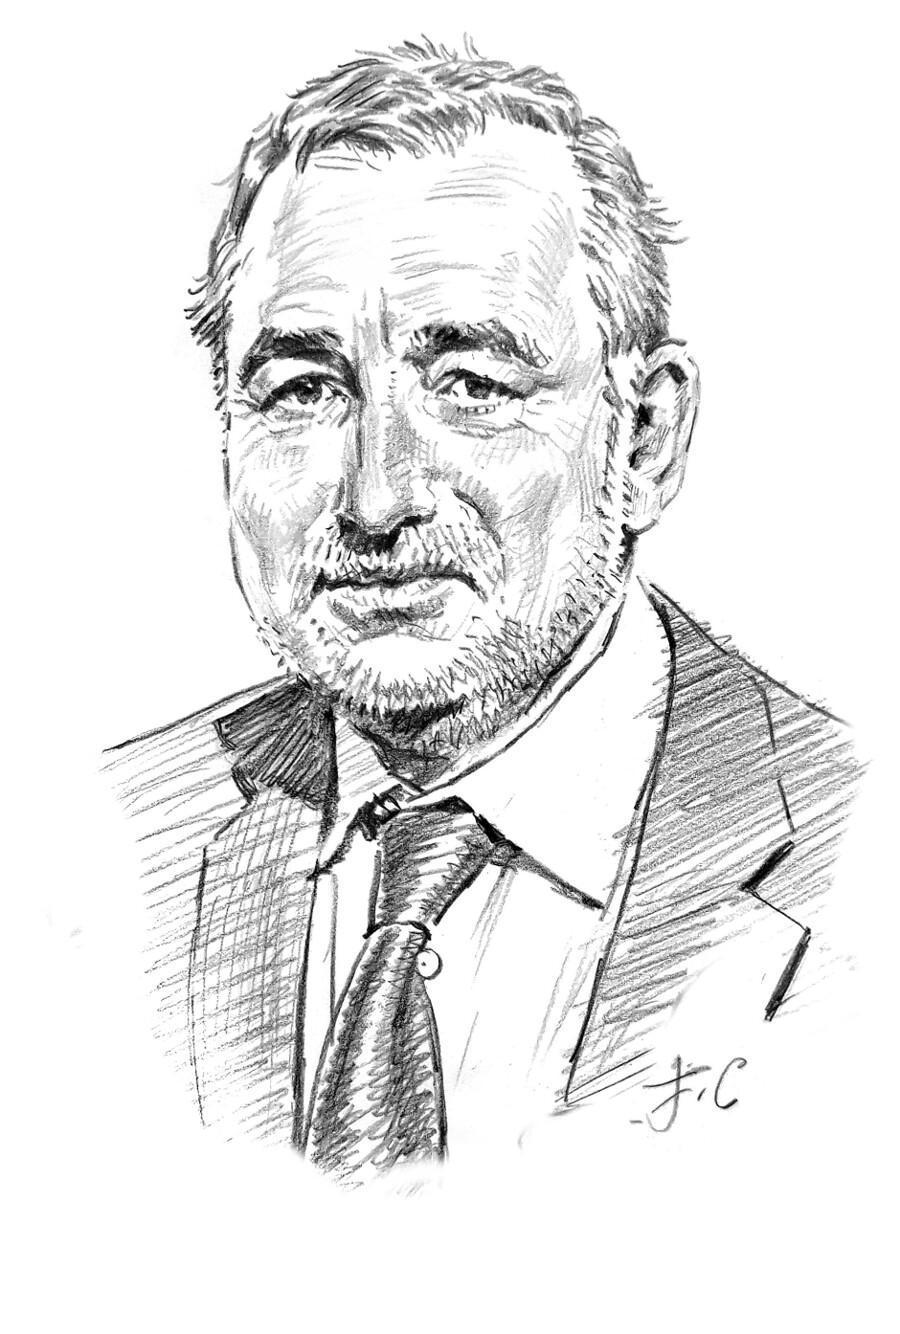 Arnaud Teyssier